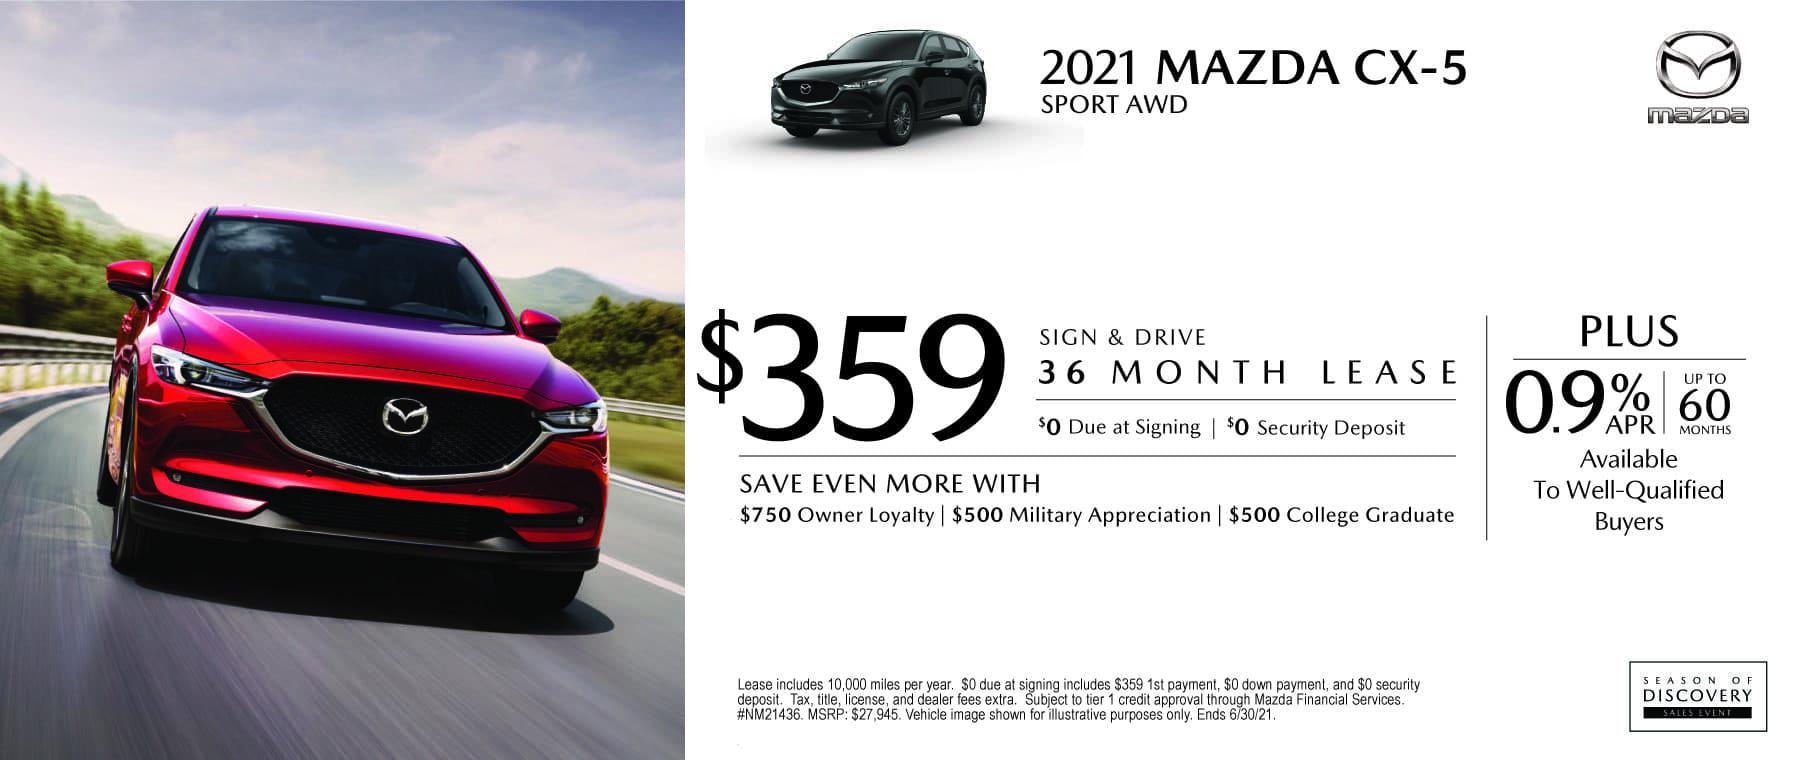 June-2021-Mazda-CS-Slides_Mazda-CX-5-0-Down-2